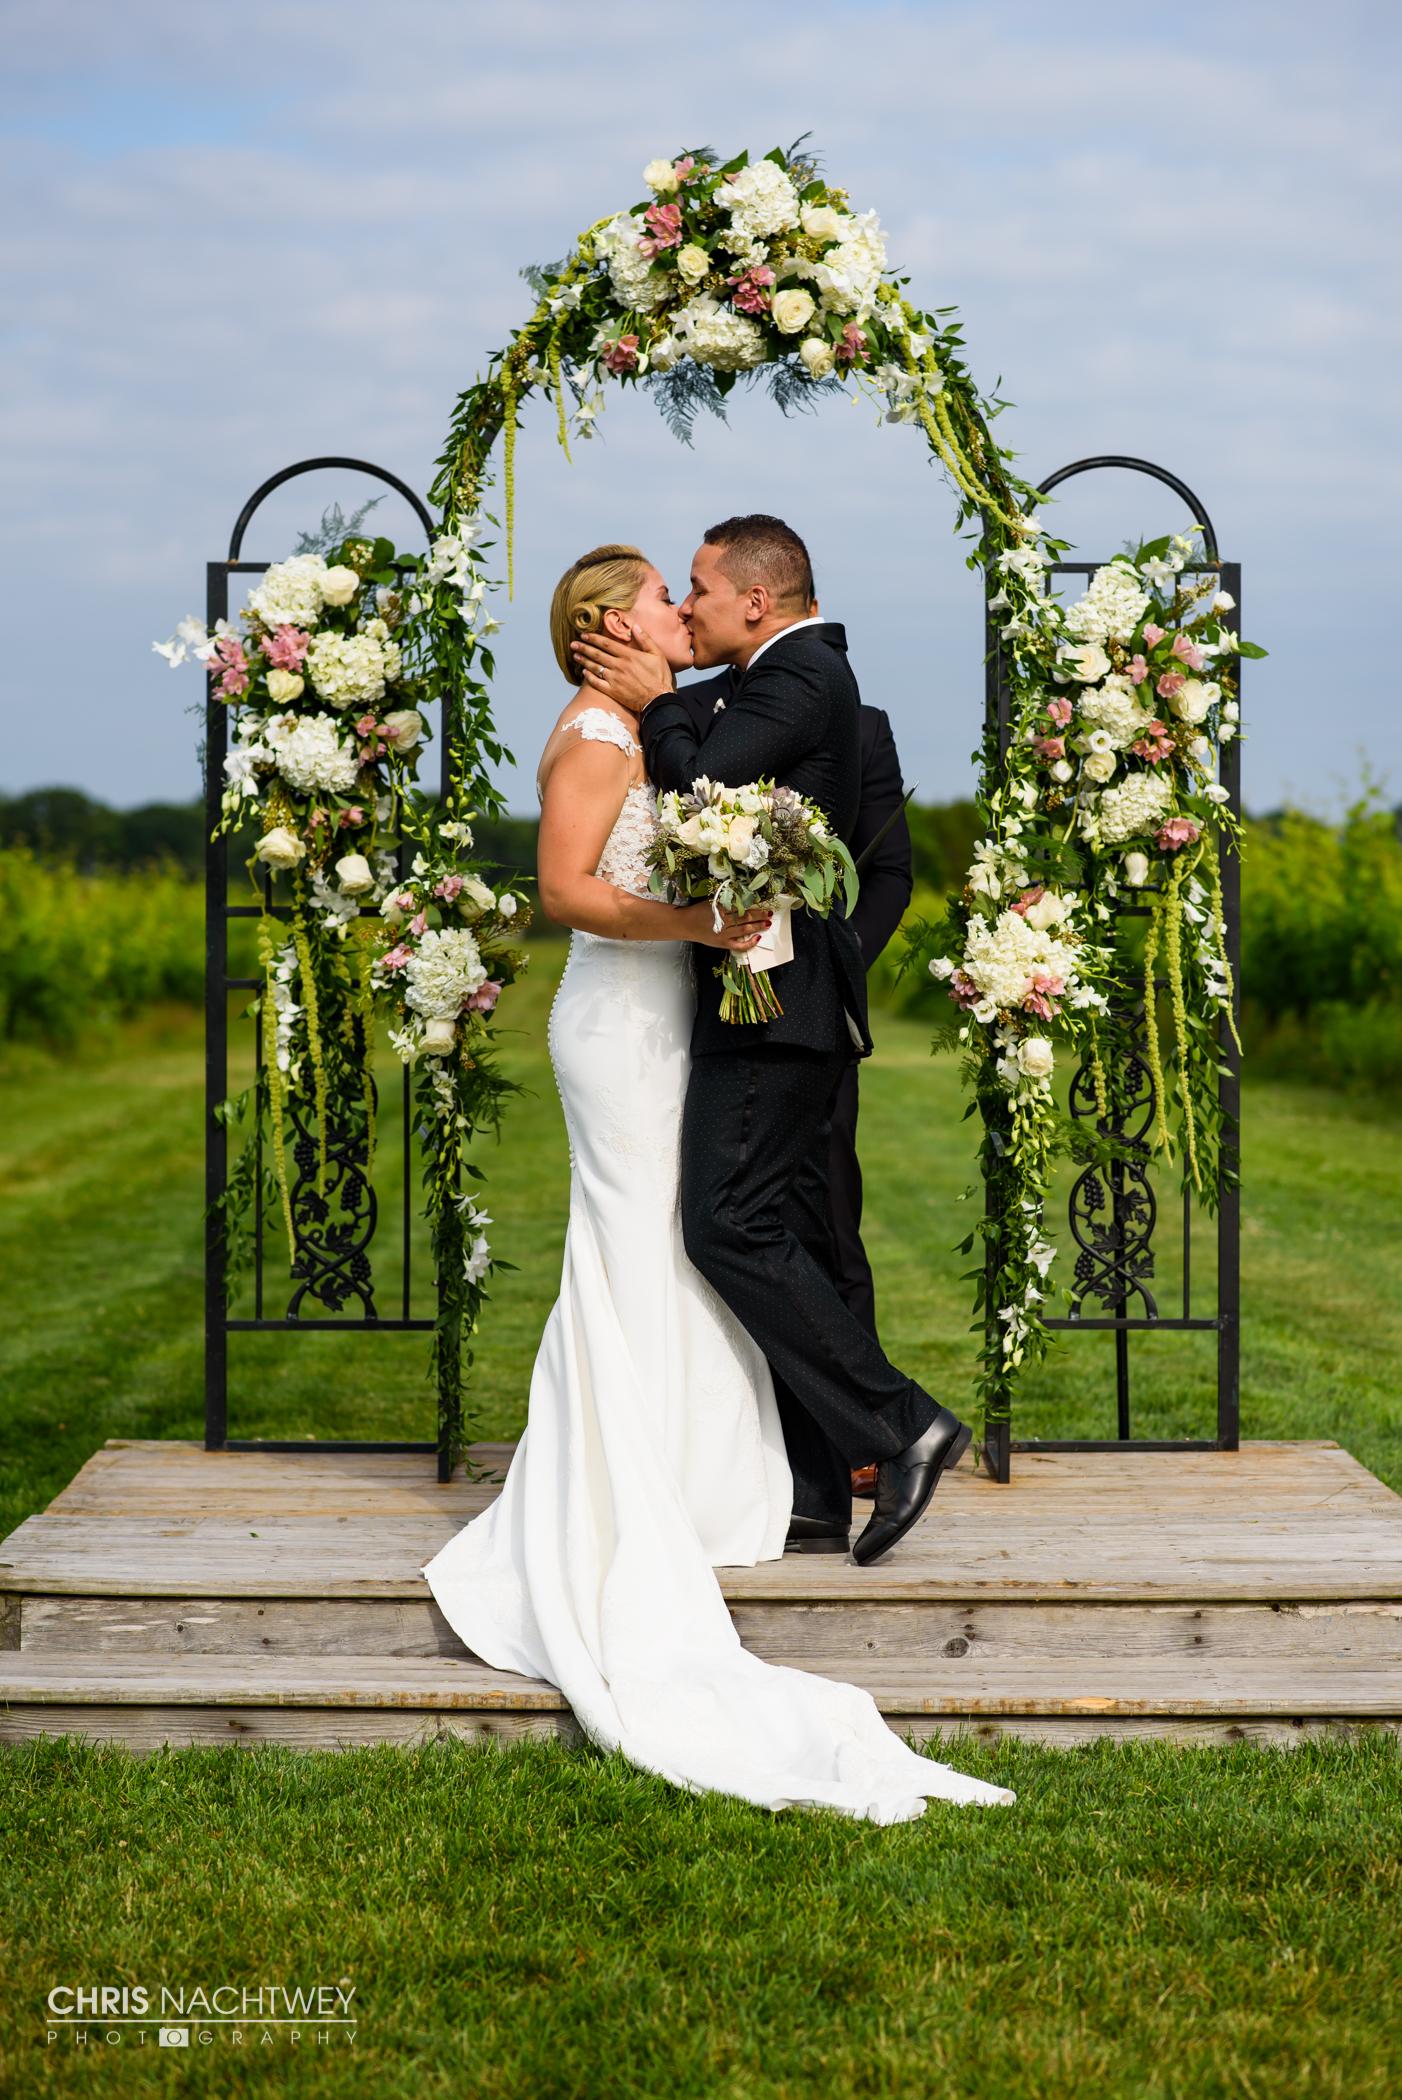 wedding-saltwater-farm-vineyard-photos-stonington-ct-chris-nachtwey-photography-2016-ana-austin-23.jpg